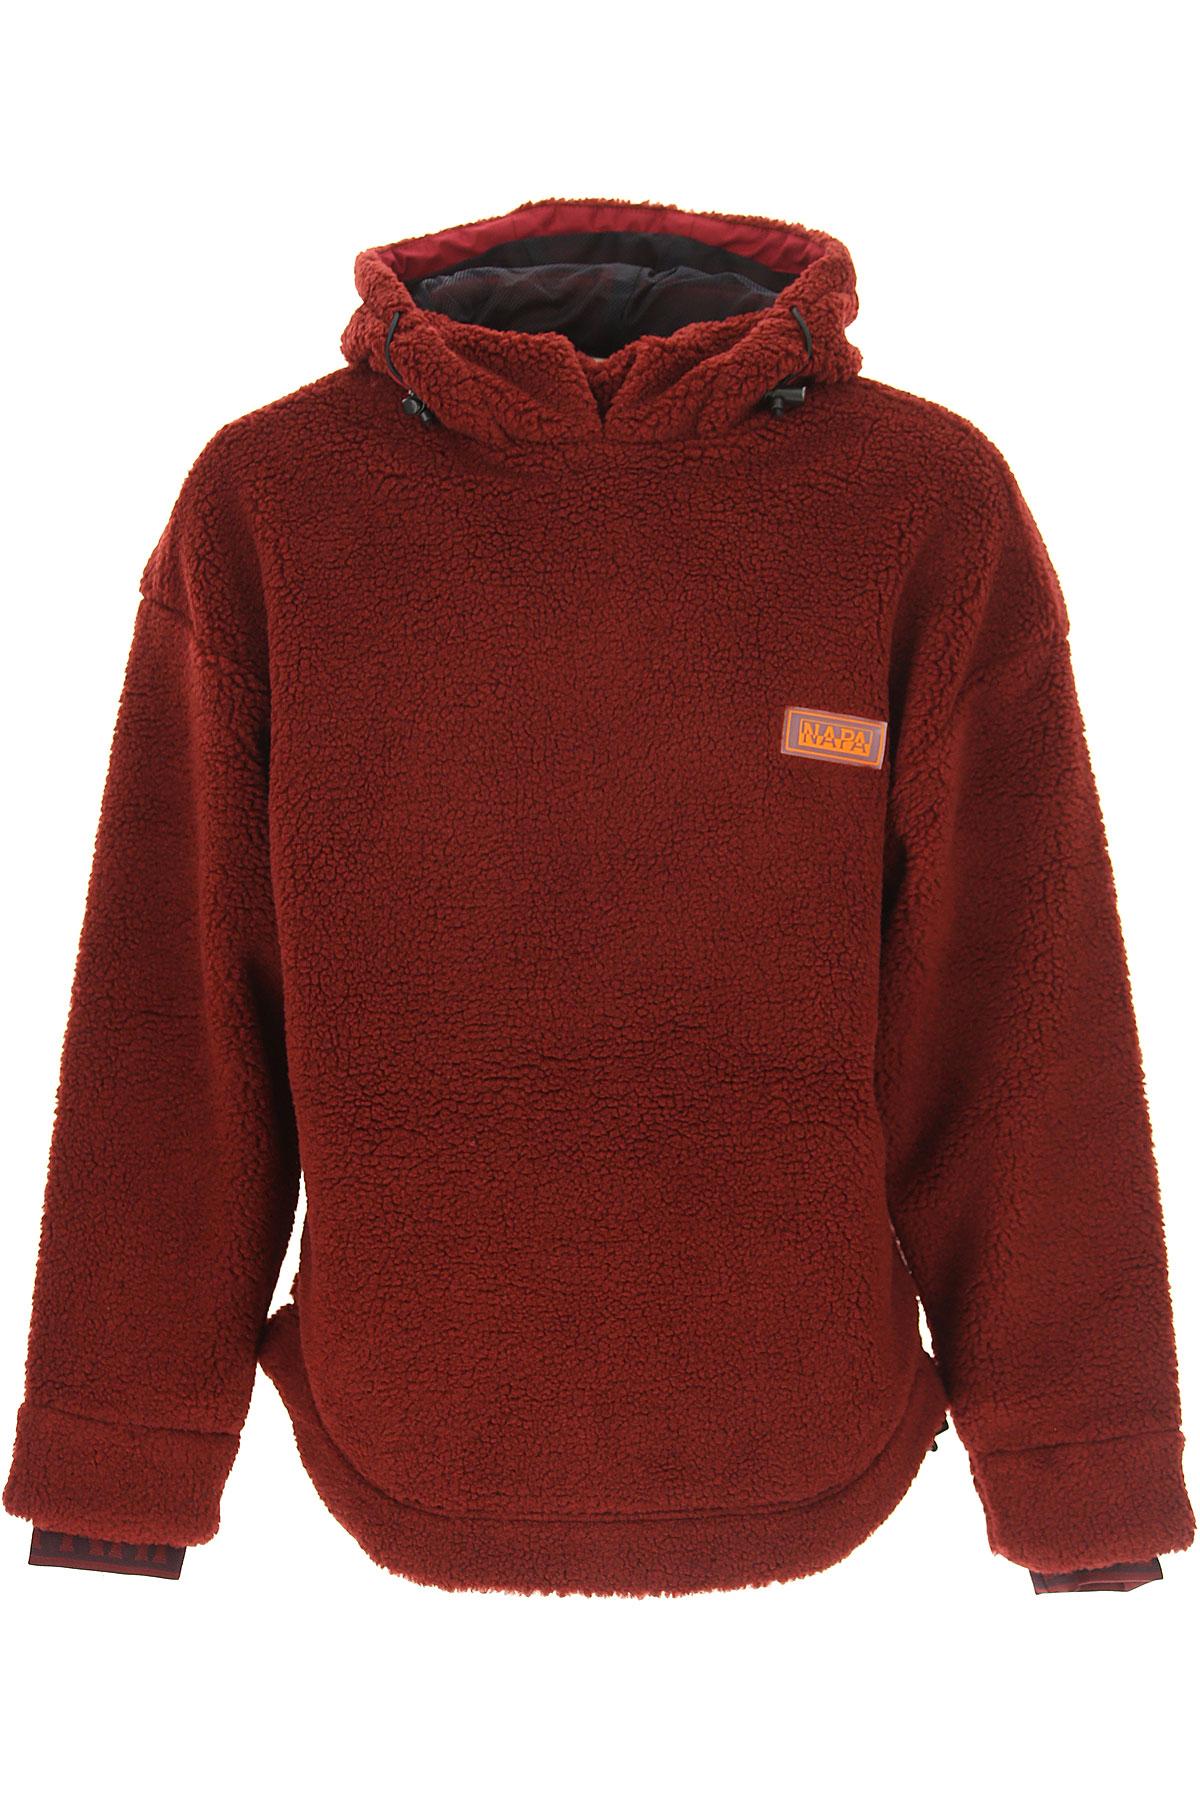 Image of Napapijri Sweater for Men Jumper, Bordeau, polyester, 2017, L M S